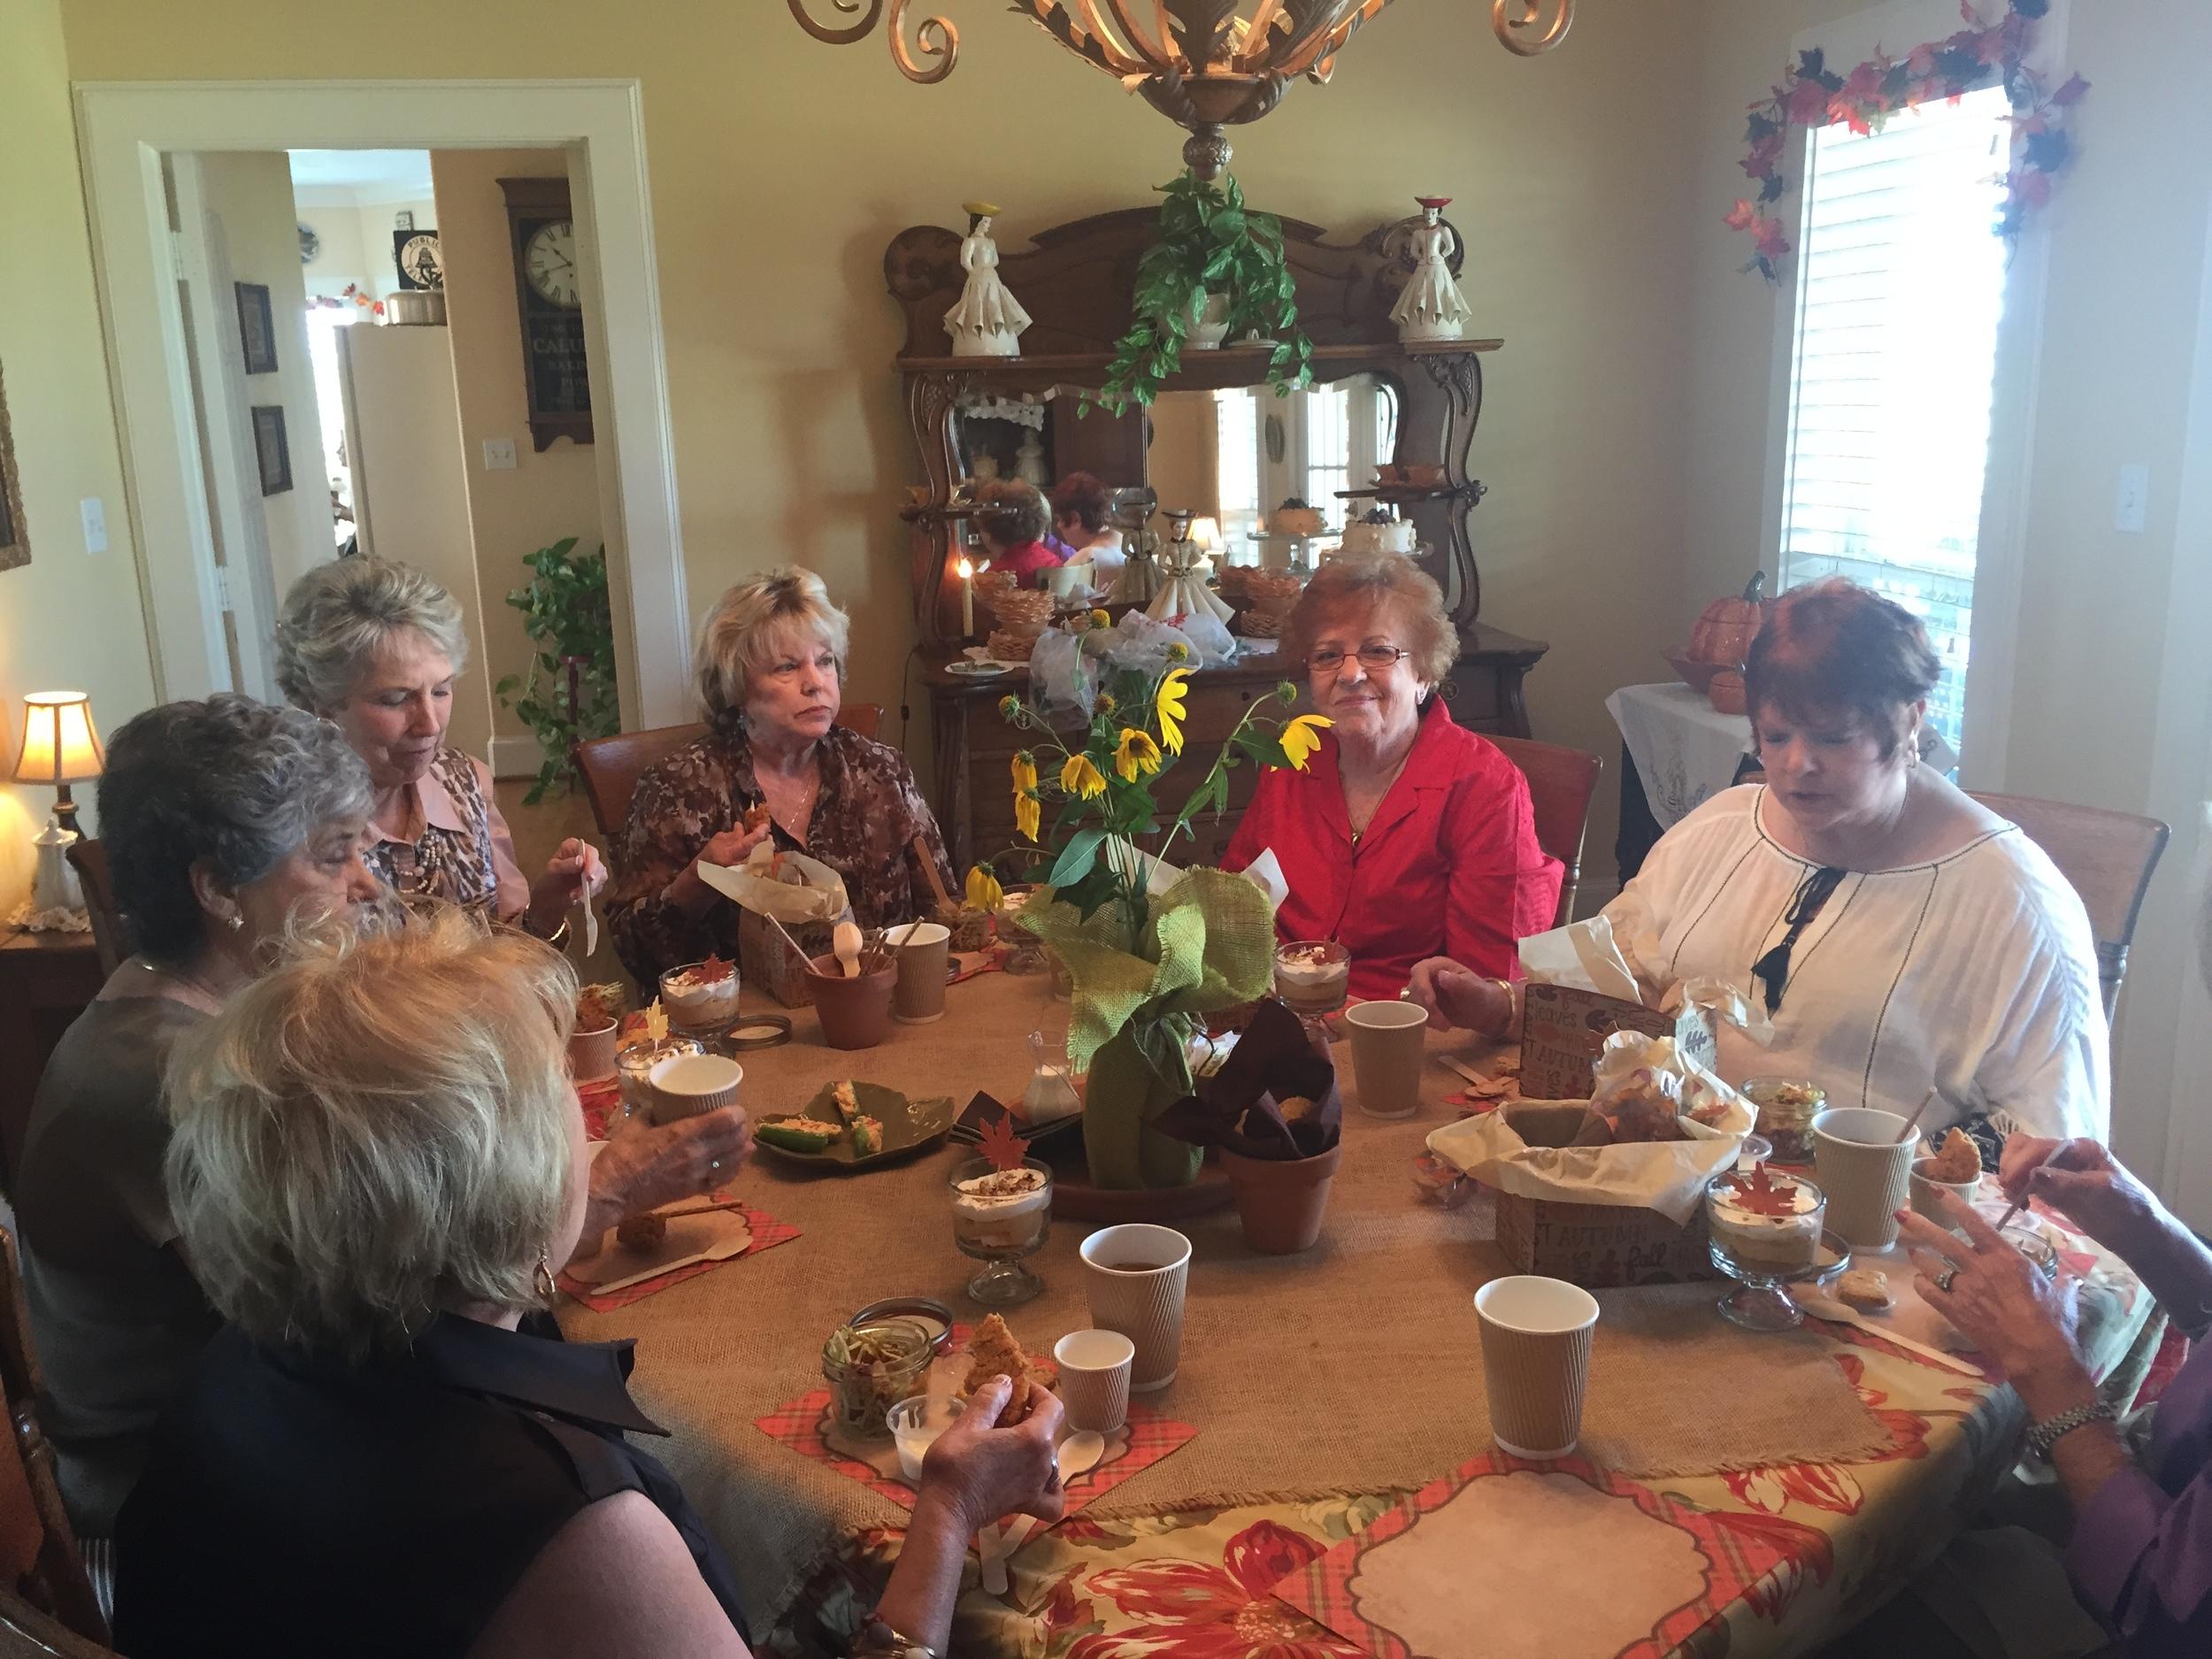 Front Left to Right: Linda Blum, Jere Longhofer, Sherry Barkman, Gail Pinto, Charleen Jones, Patsy Hermann - enjoying the picnic.